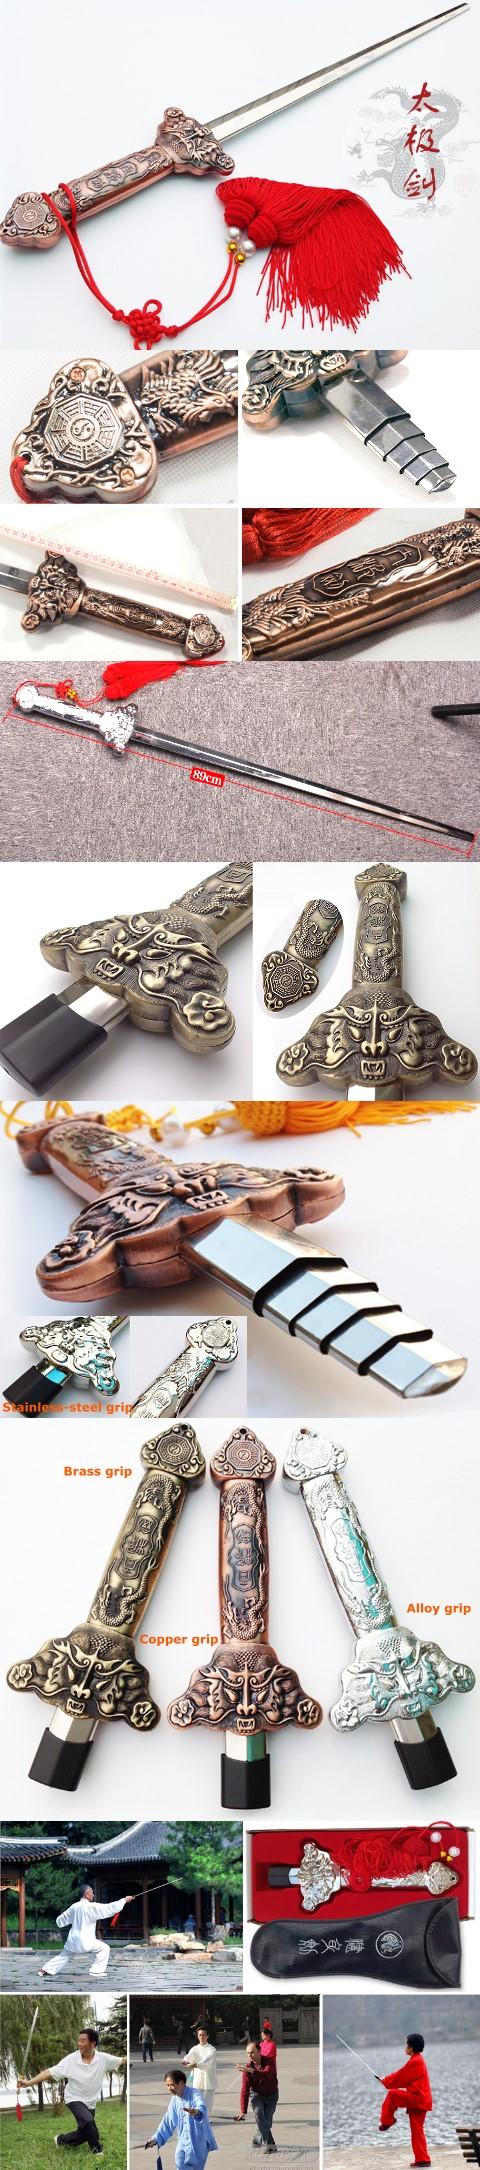 Extensible Taichi Sword